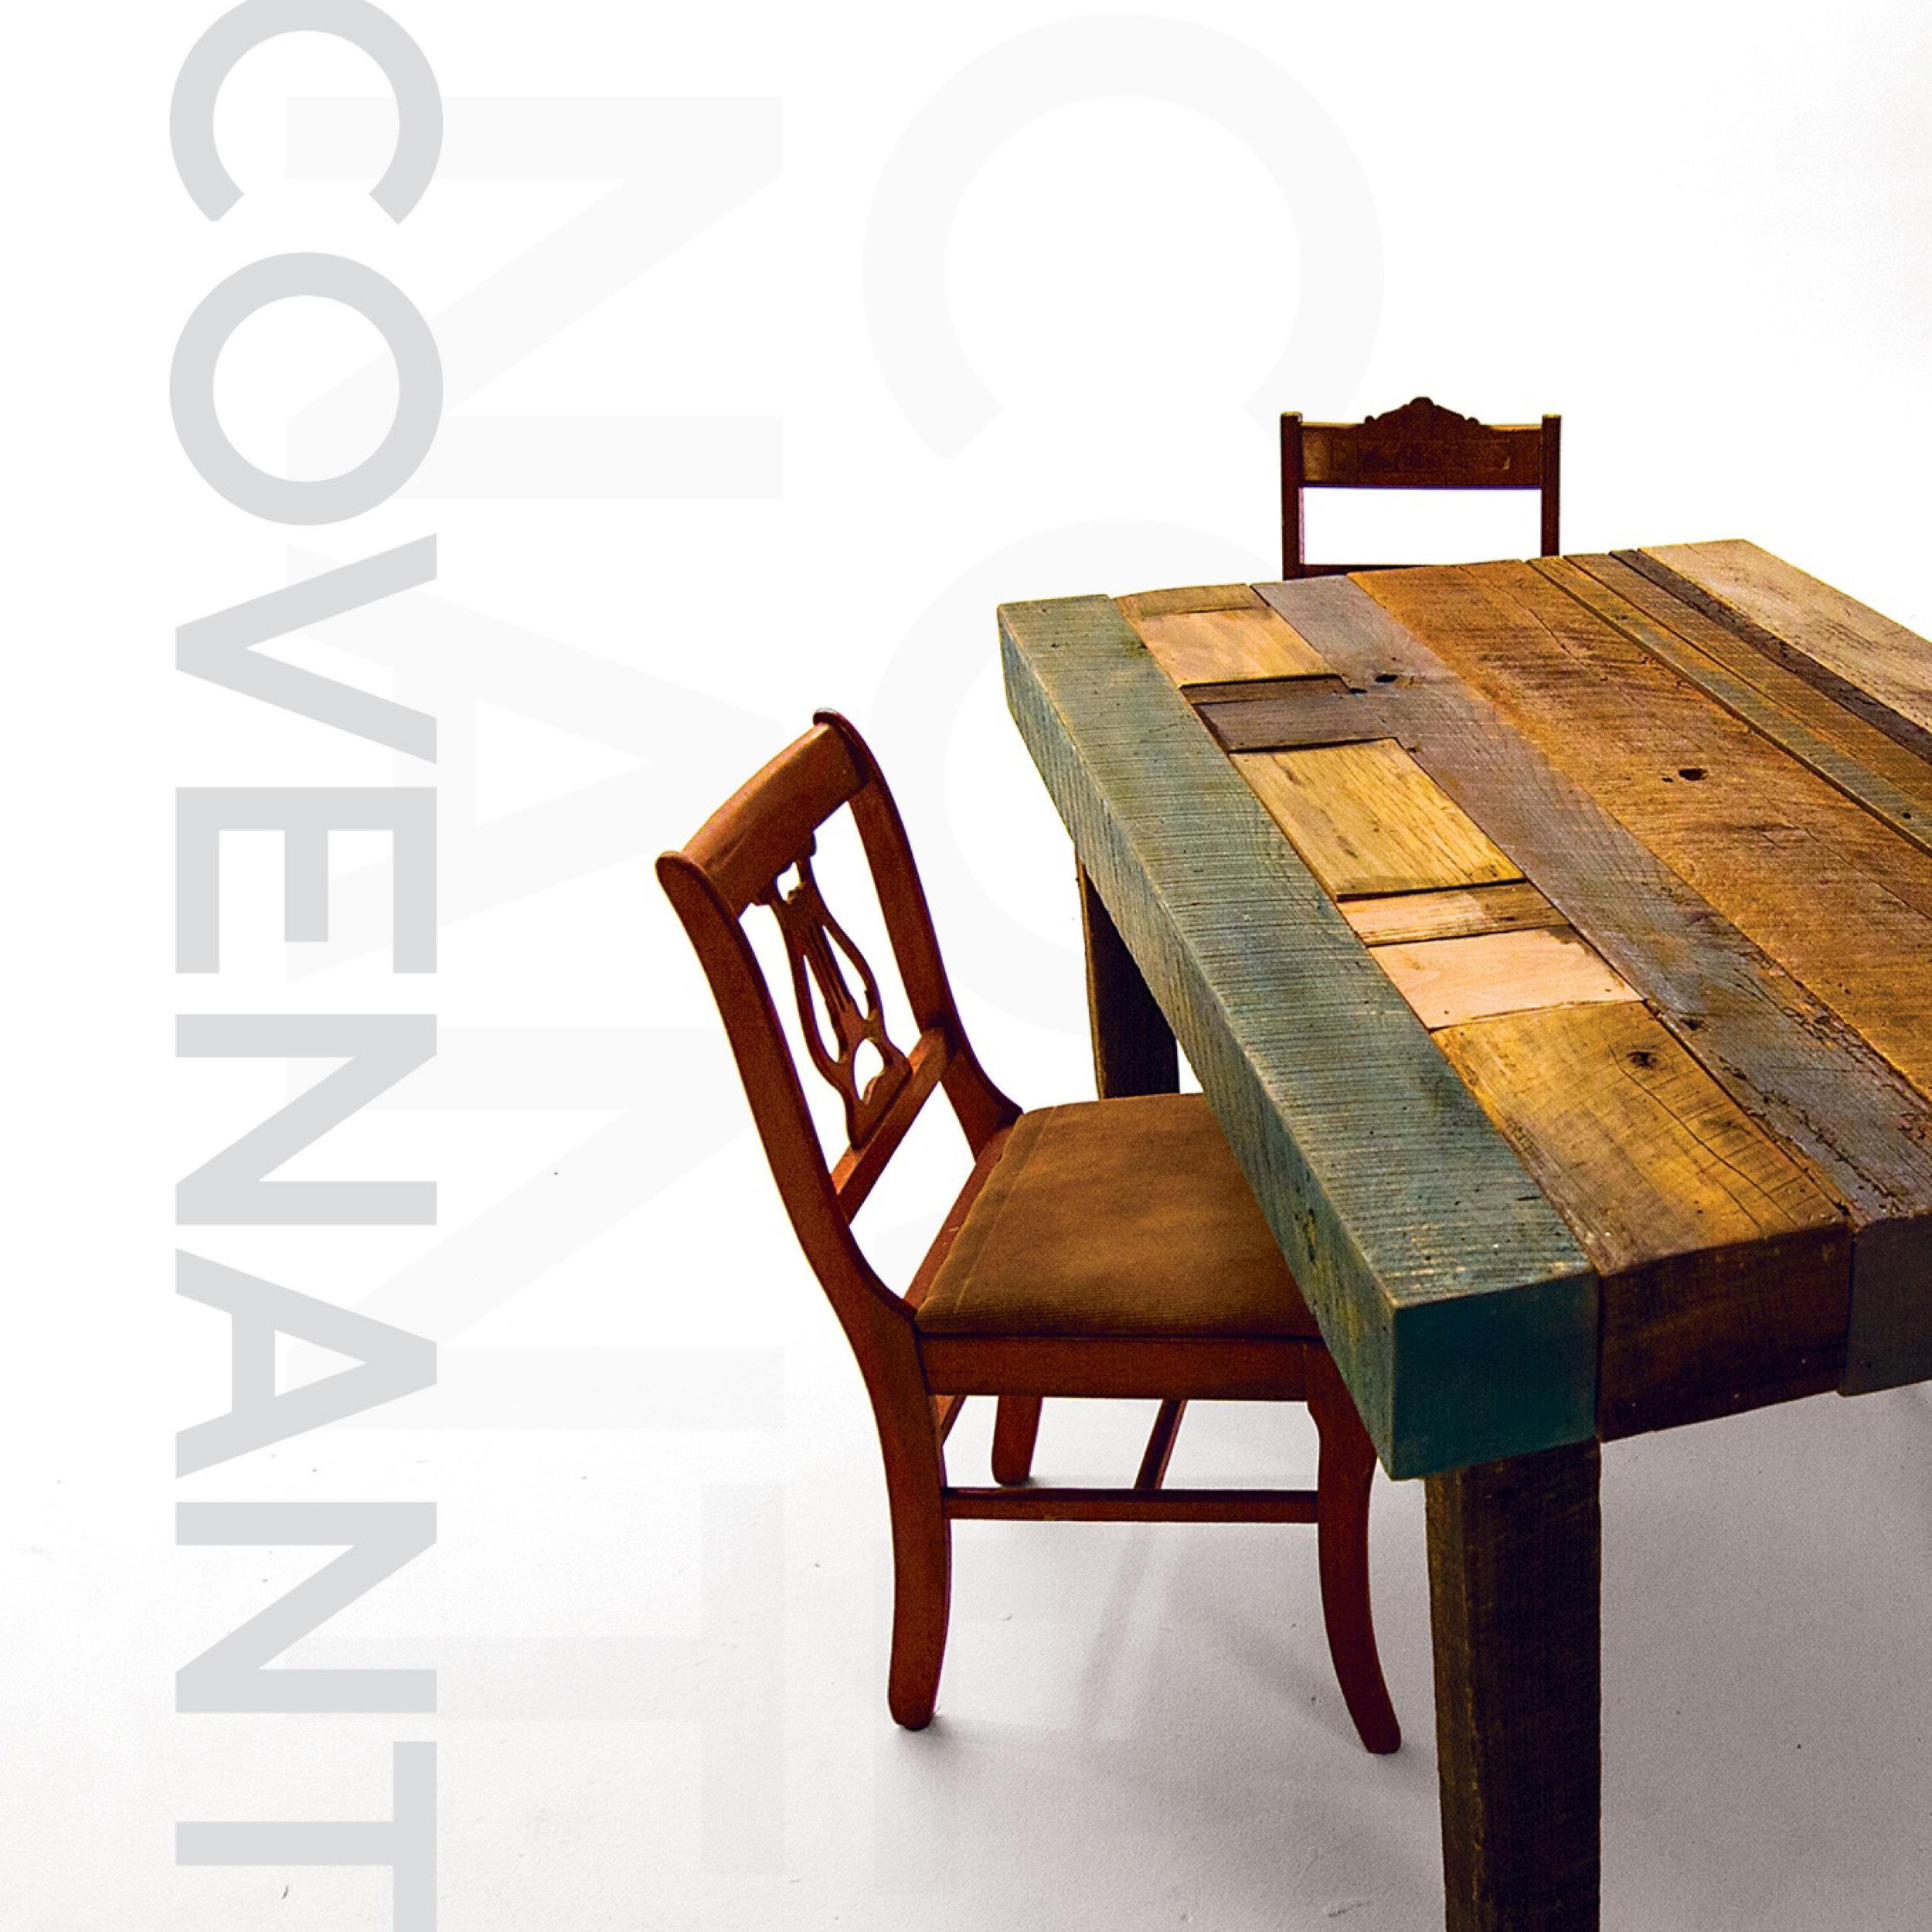 Covenant_IGsmall.jpg